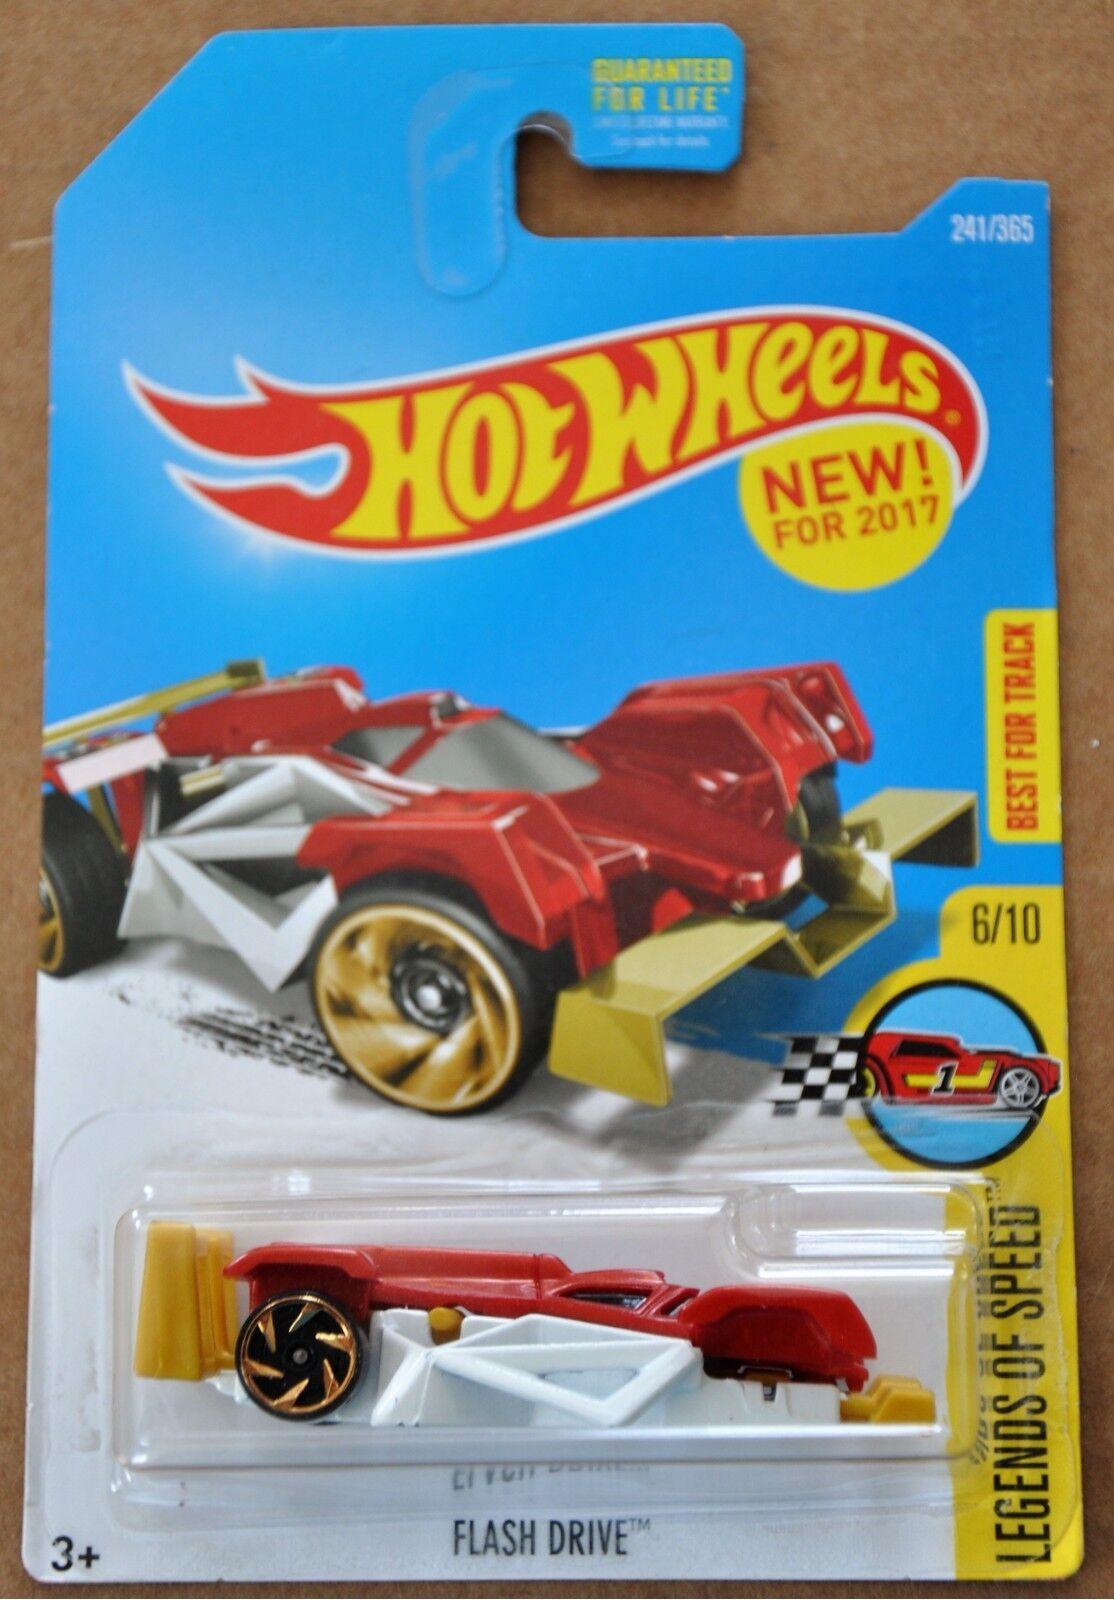 2017 Hot Wheels Flash Drive 241/365 Legends of Speed 6/10 ER